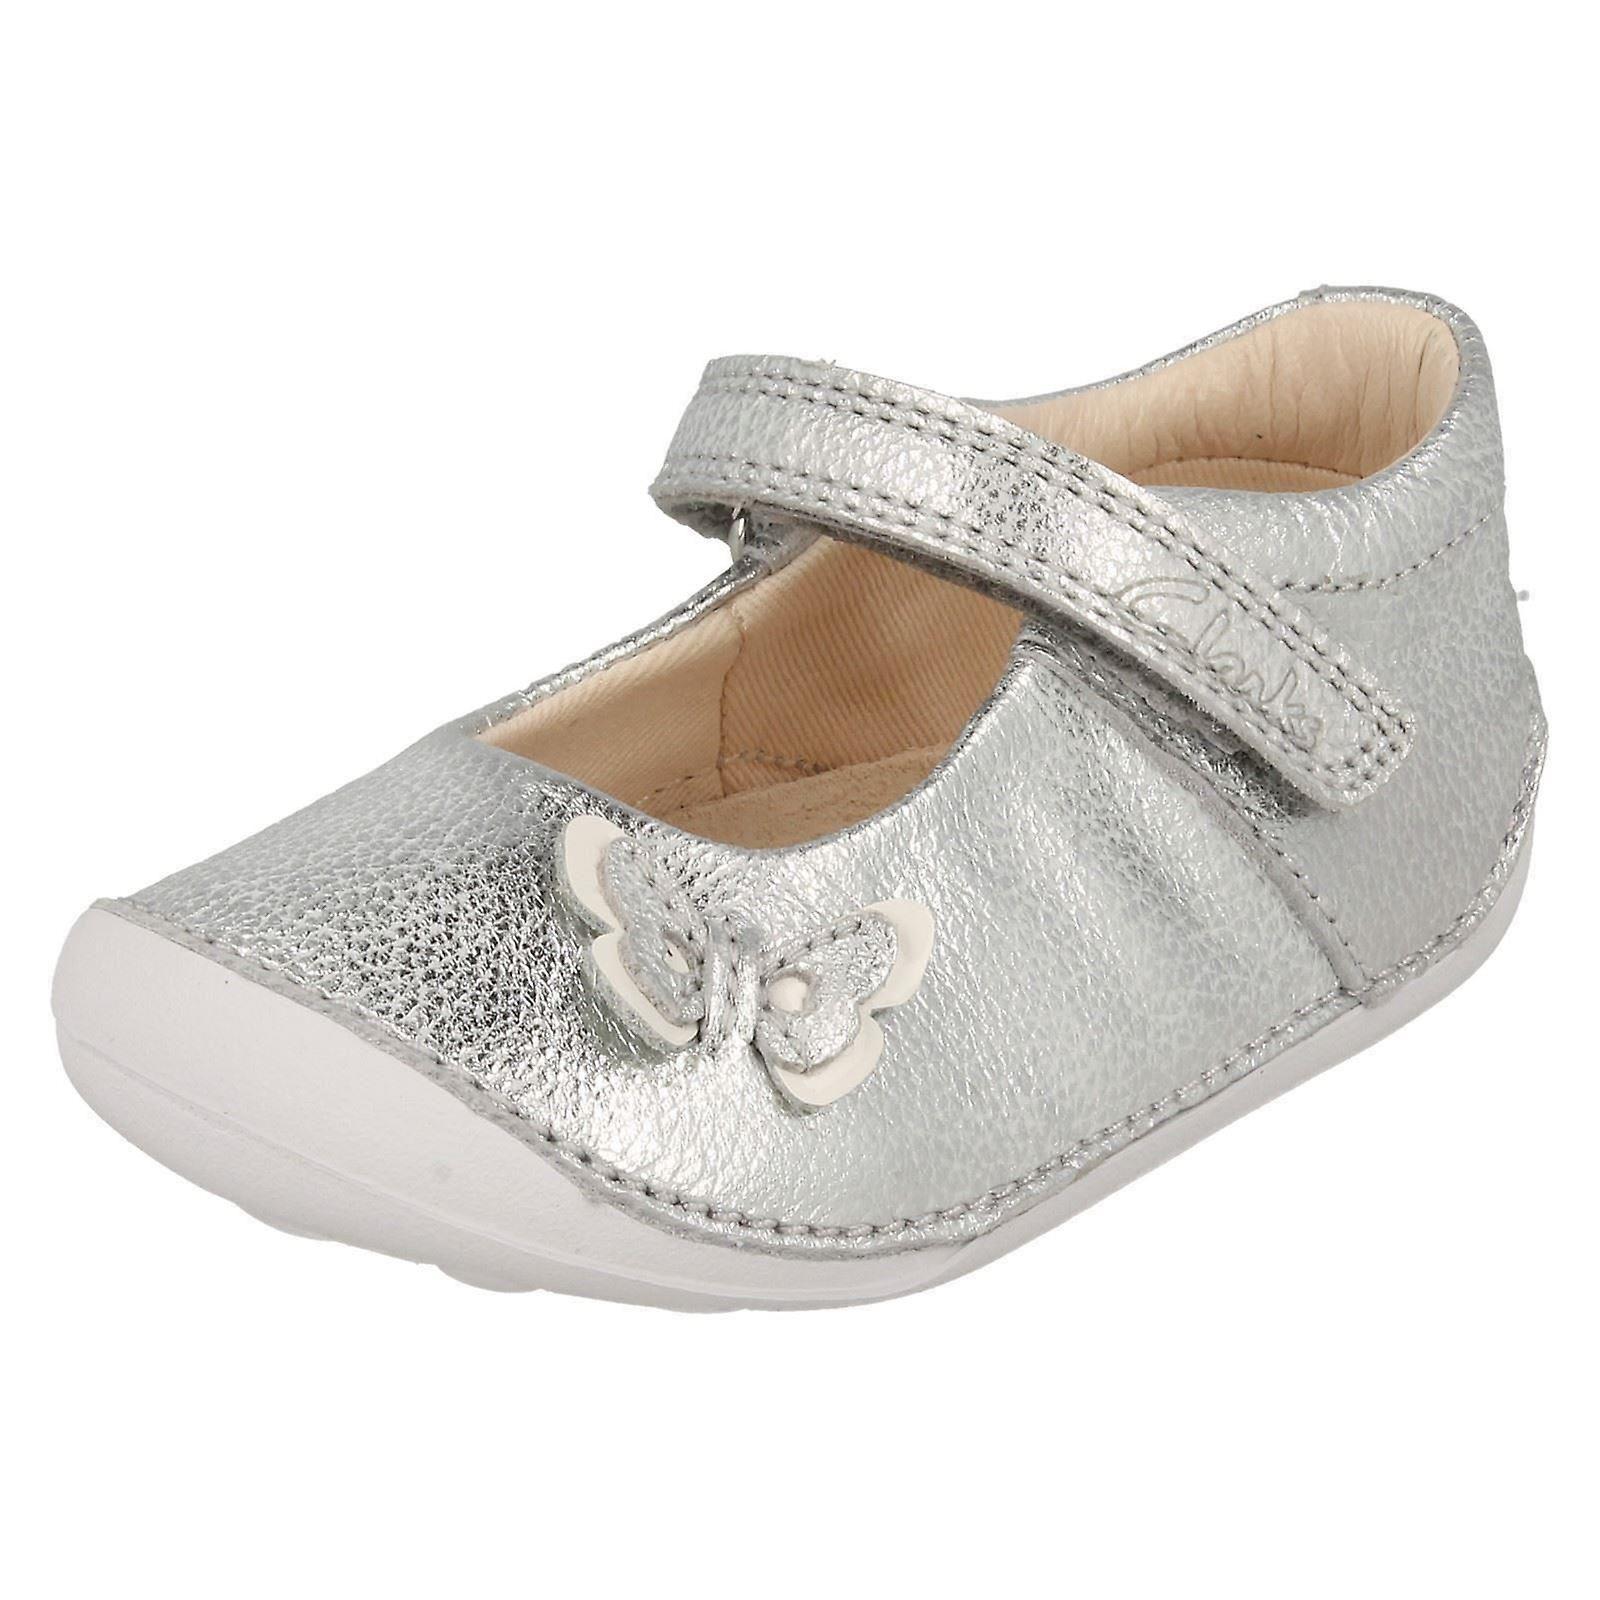 Infant Girls Clarks First Cruiser Shoes Little Mia- Modern -Gentlemen/Ladies And Elegant In Fashion -Gentlemen/Ladies Modern e5eb24